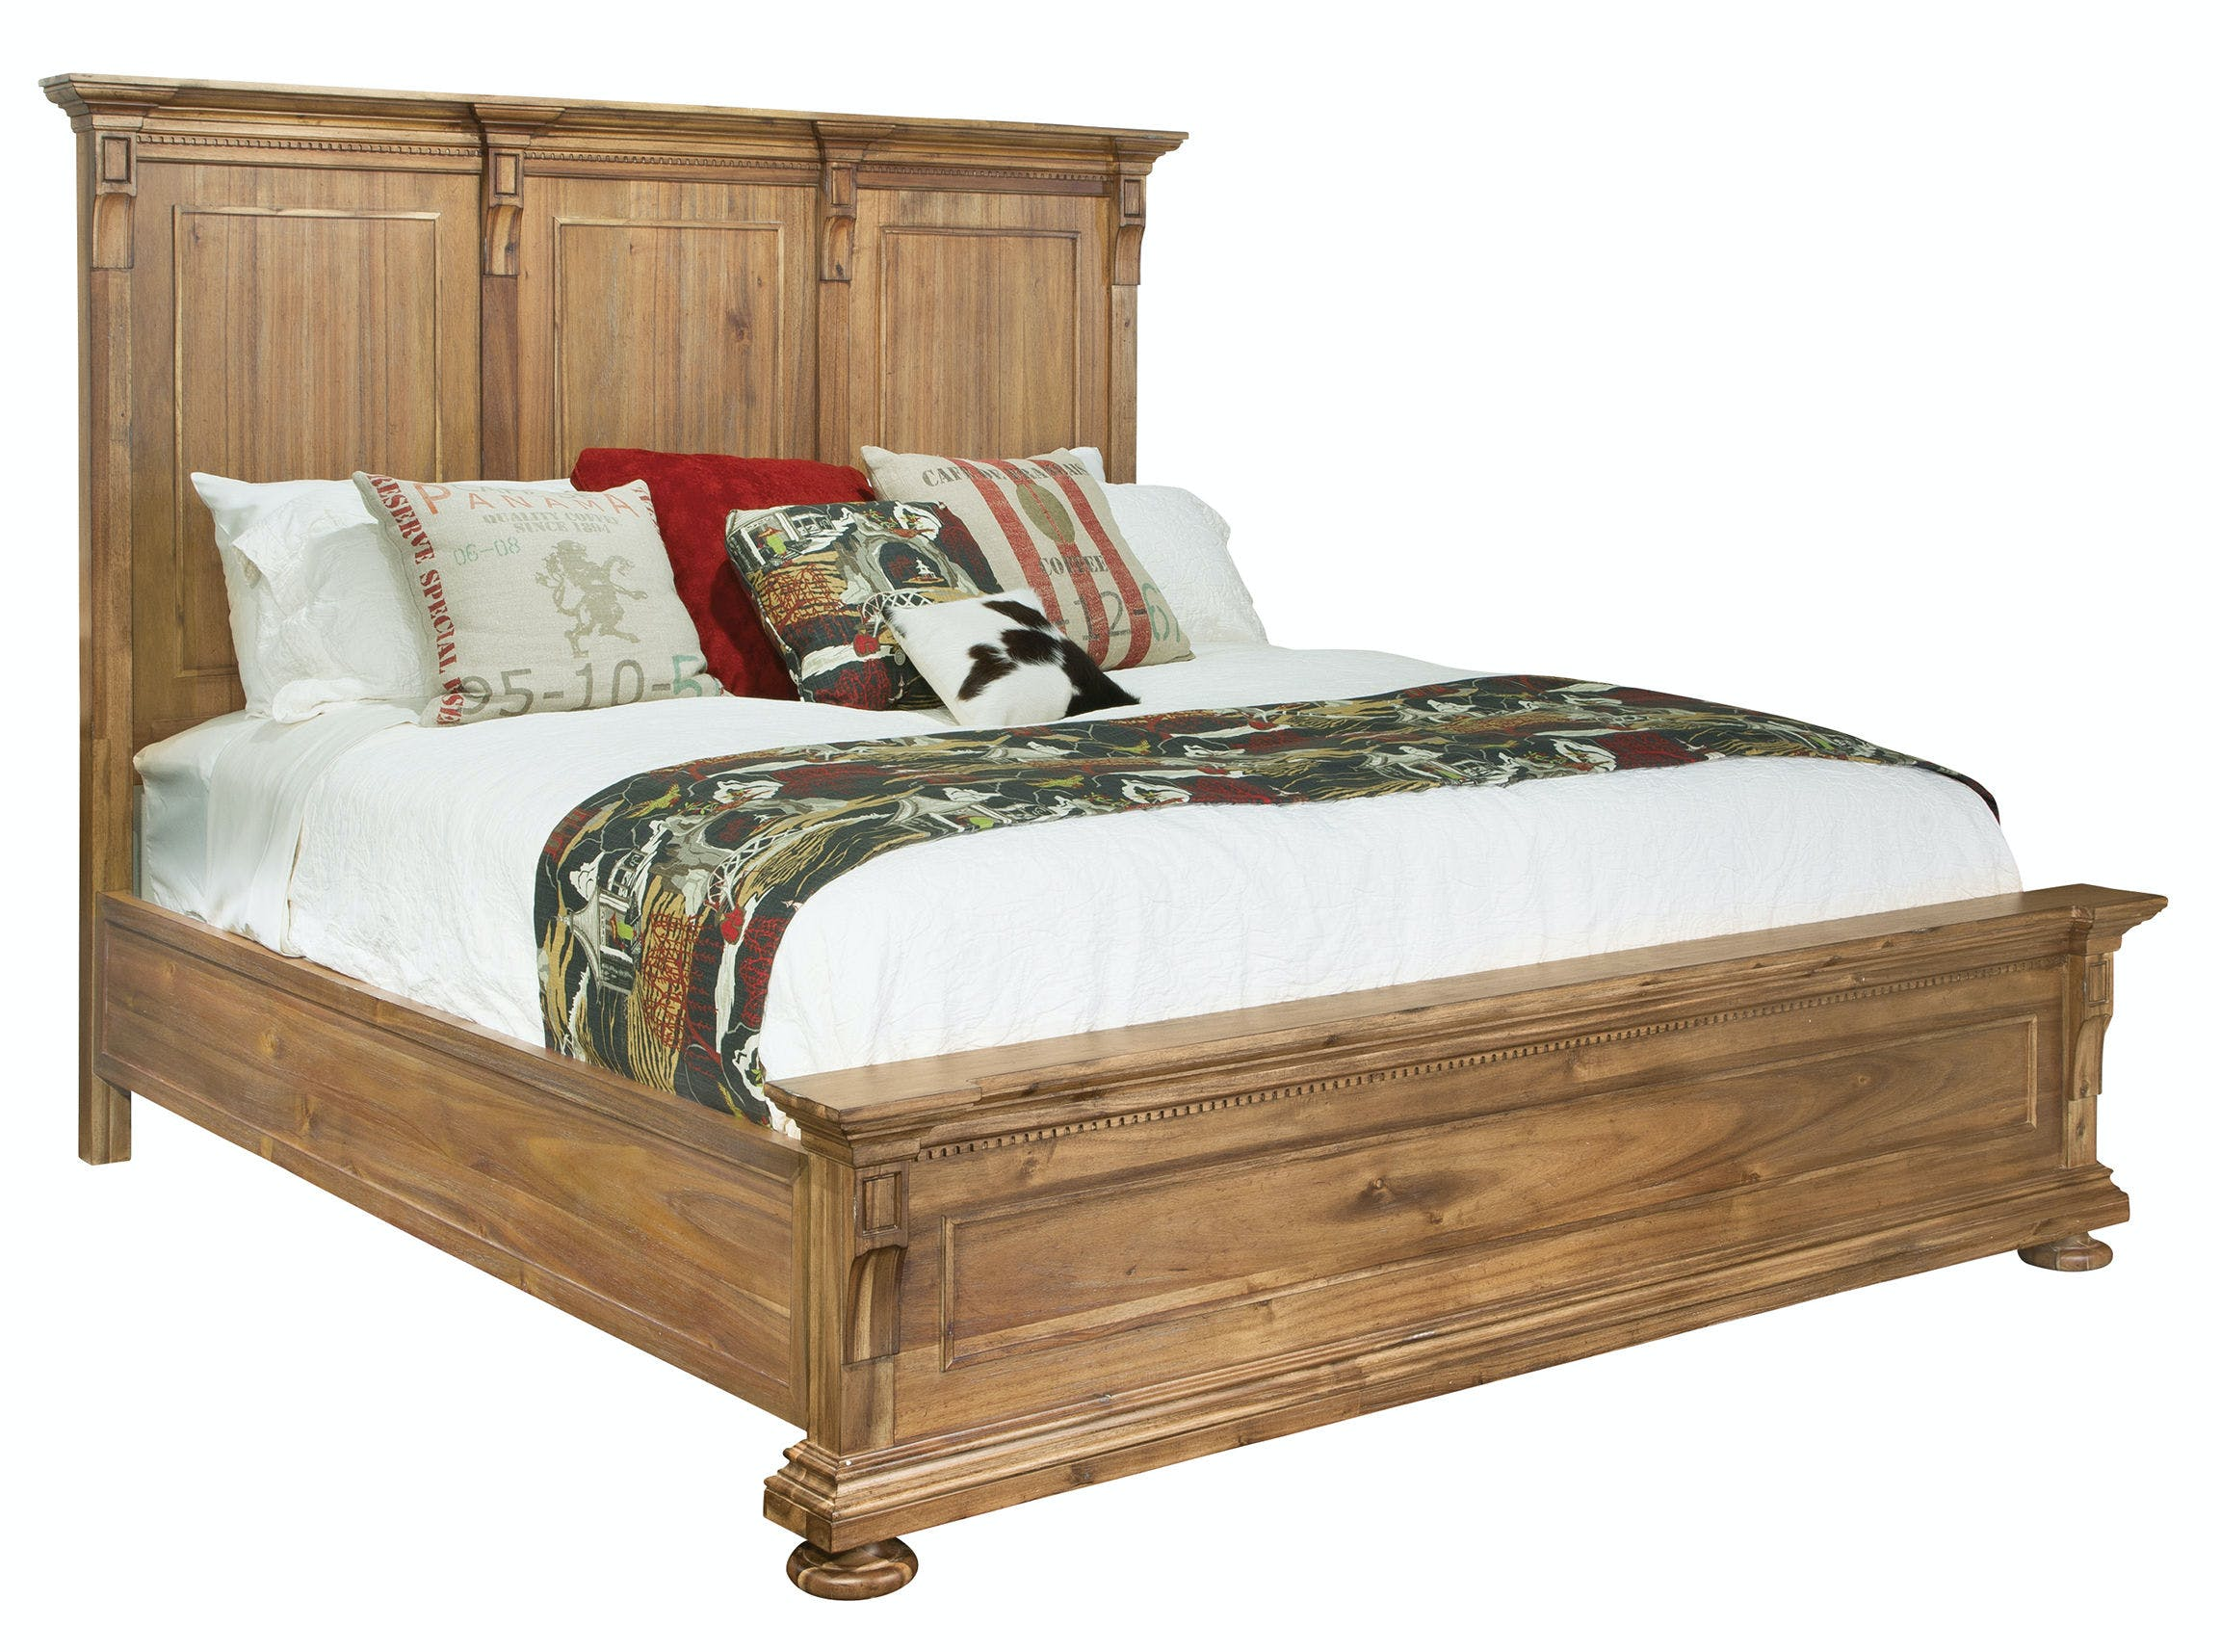 Hekman Bedroom California King Bed 23368 White House Designs For Life Fairfield Nj